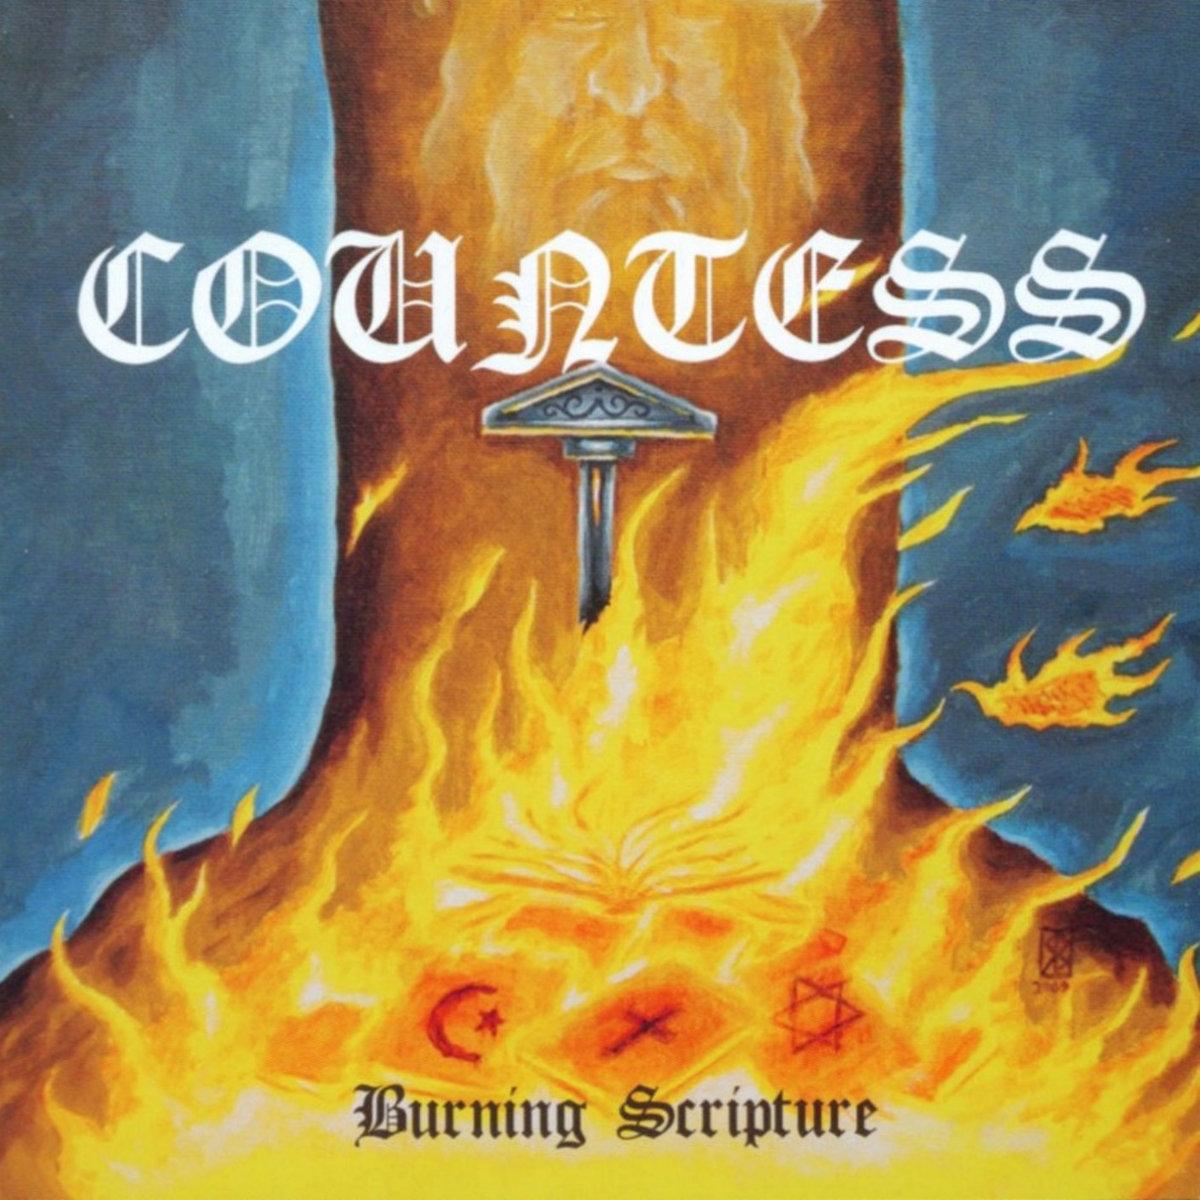 Burning Scripture | Countess